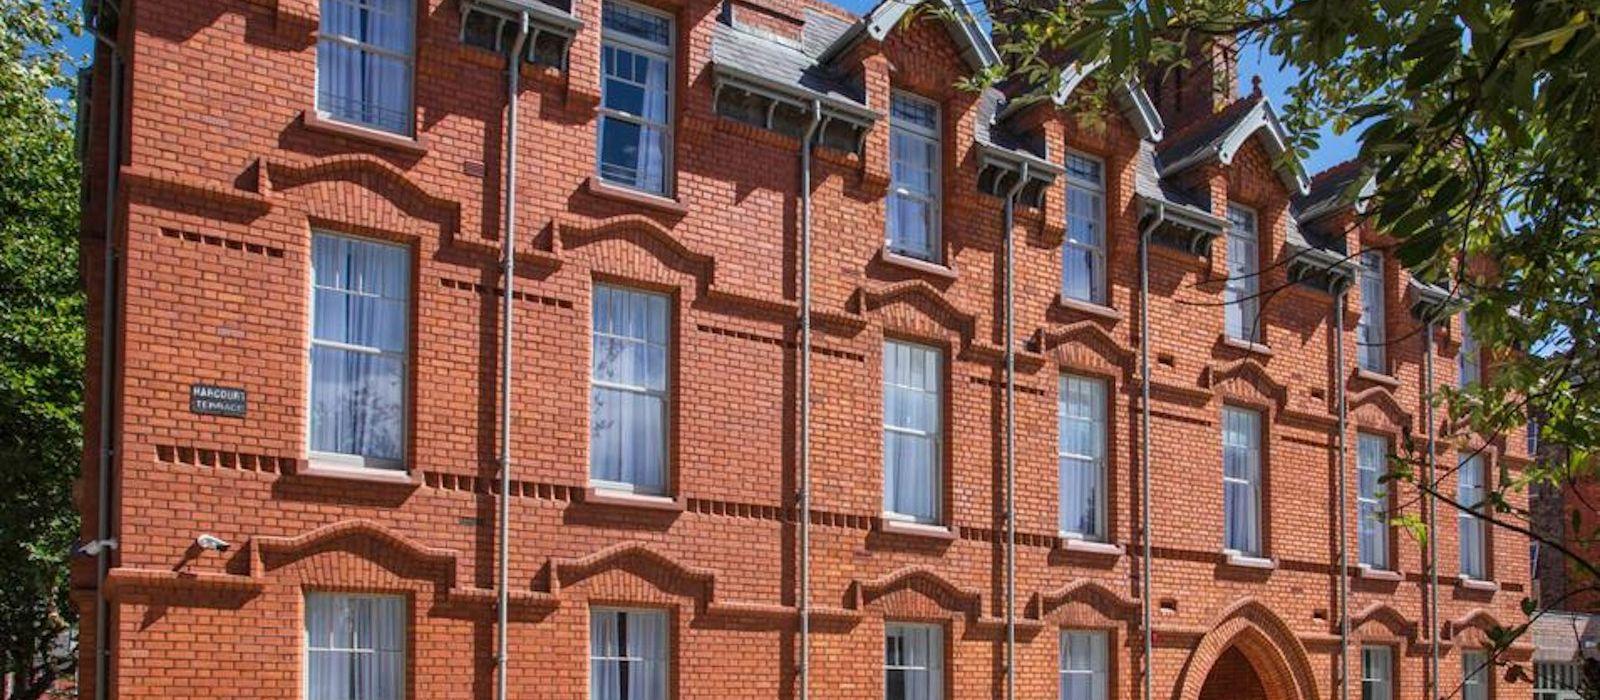 Hotel The Wilder Townhouse UK & Ireland